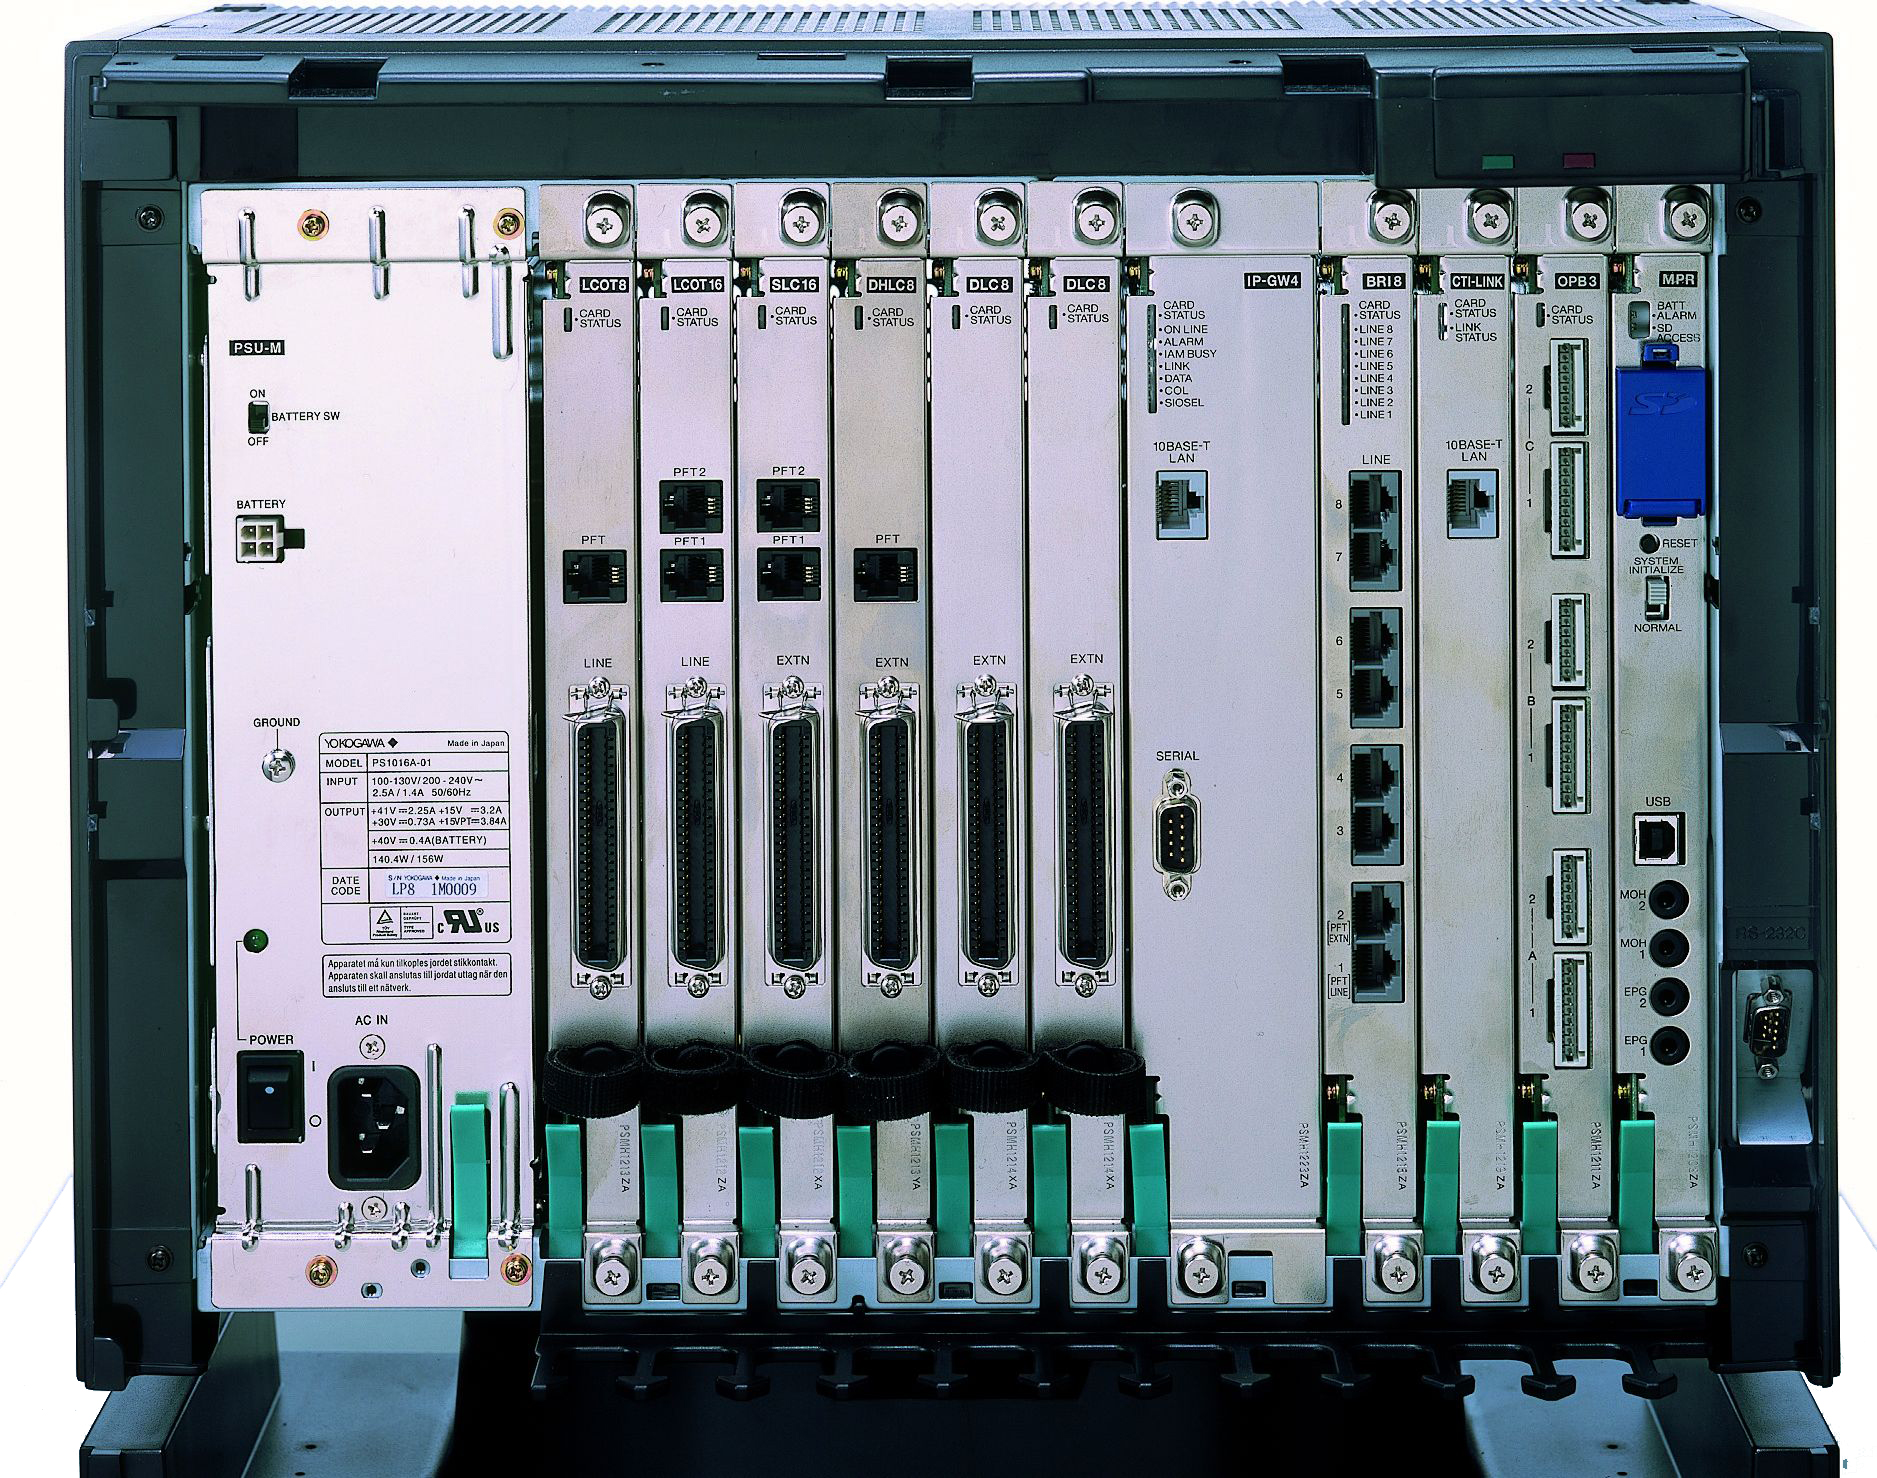 Panasonic kx- te maintenance console software